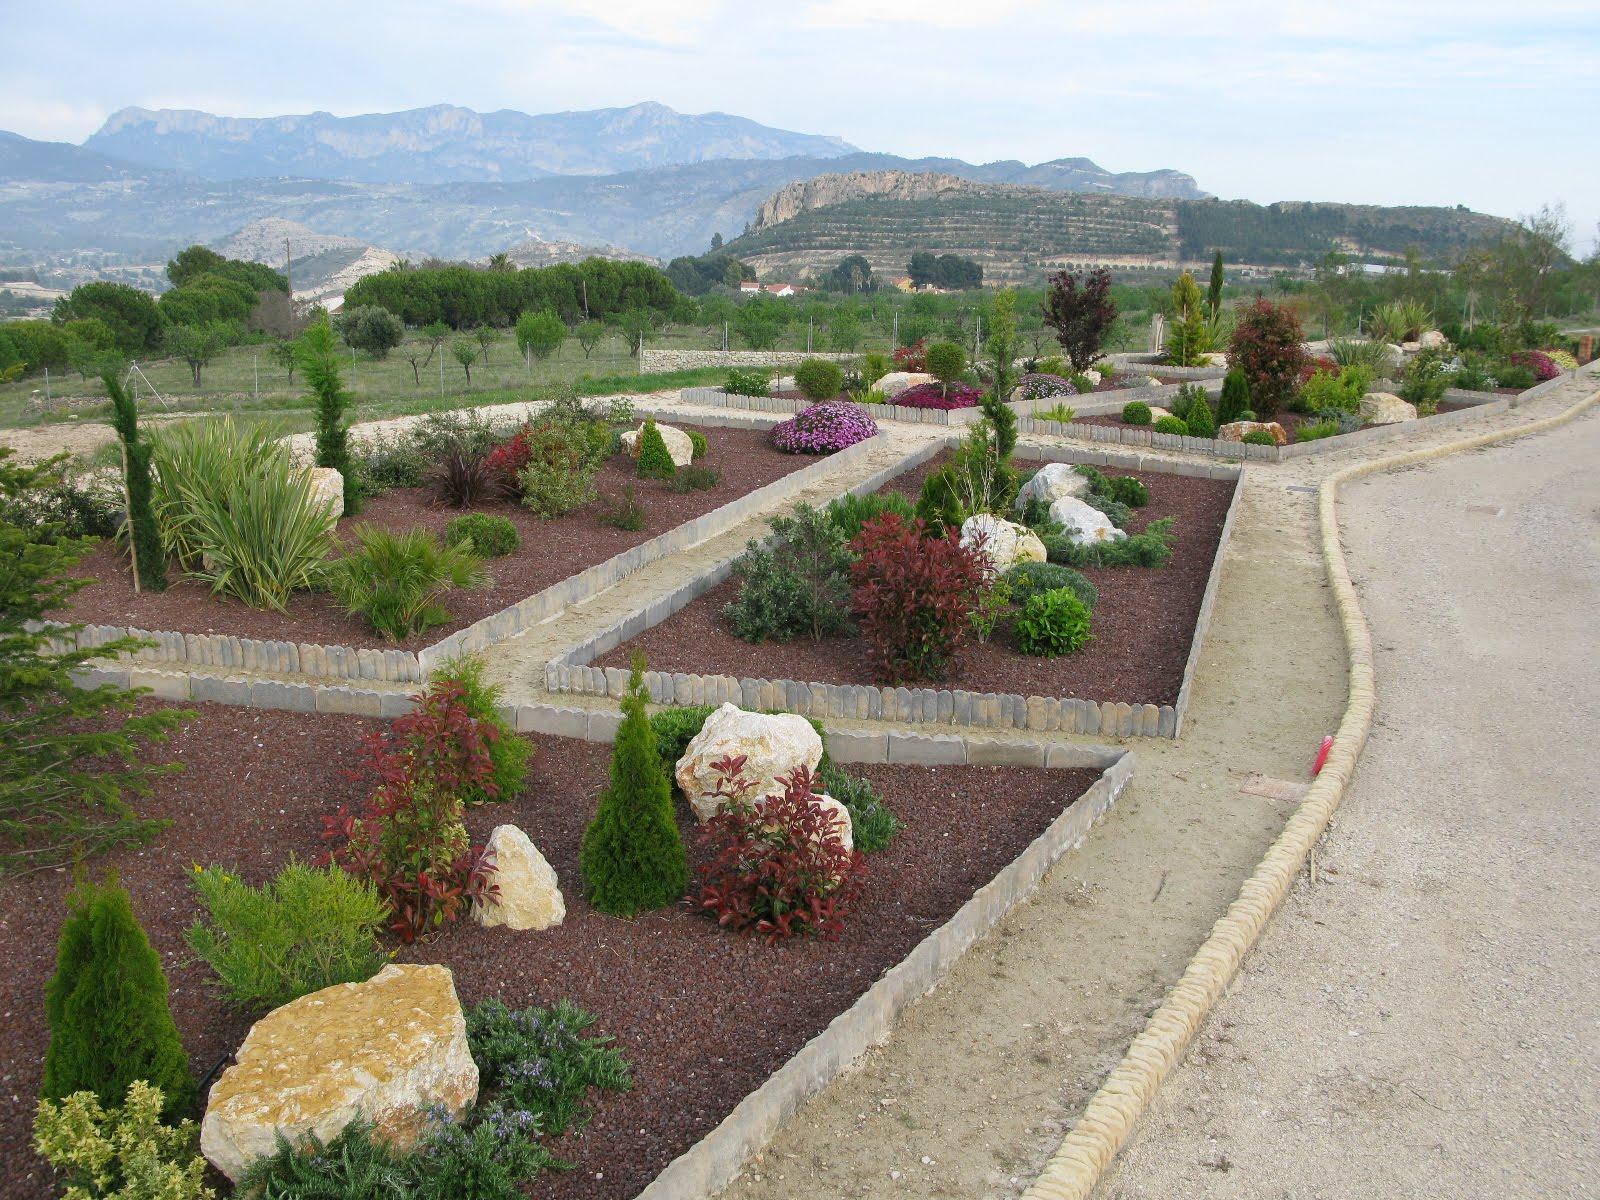 Jard N Mediterraneo Monta A Jardiner A Benidorm